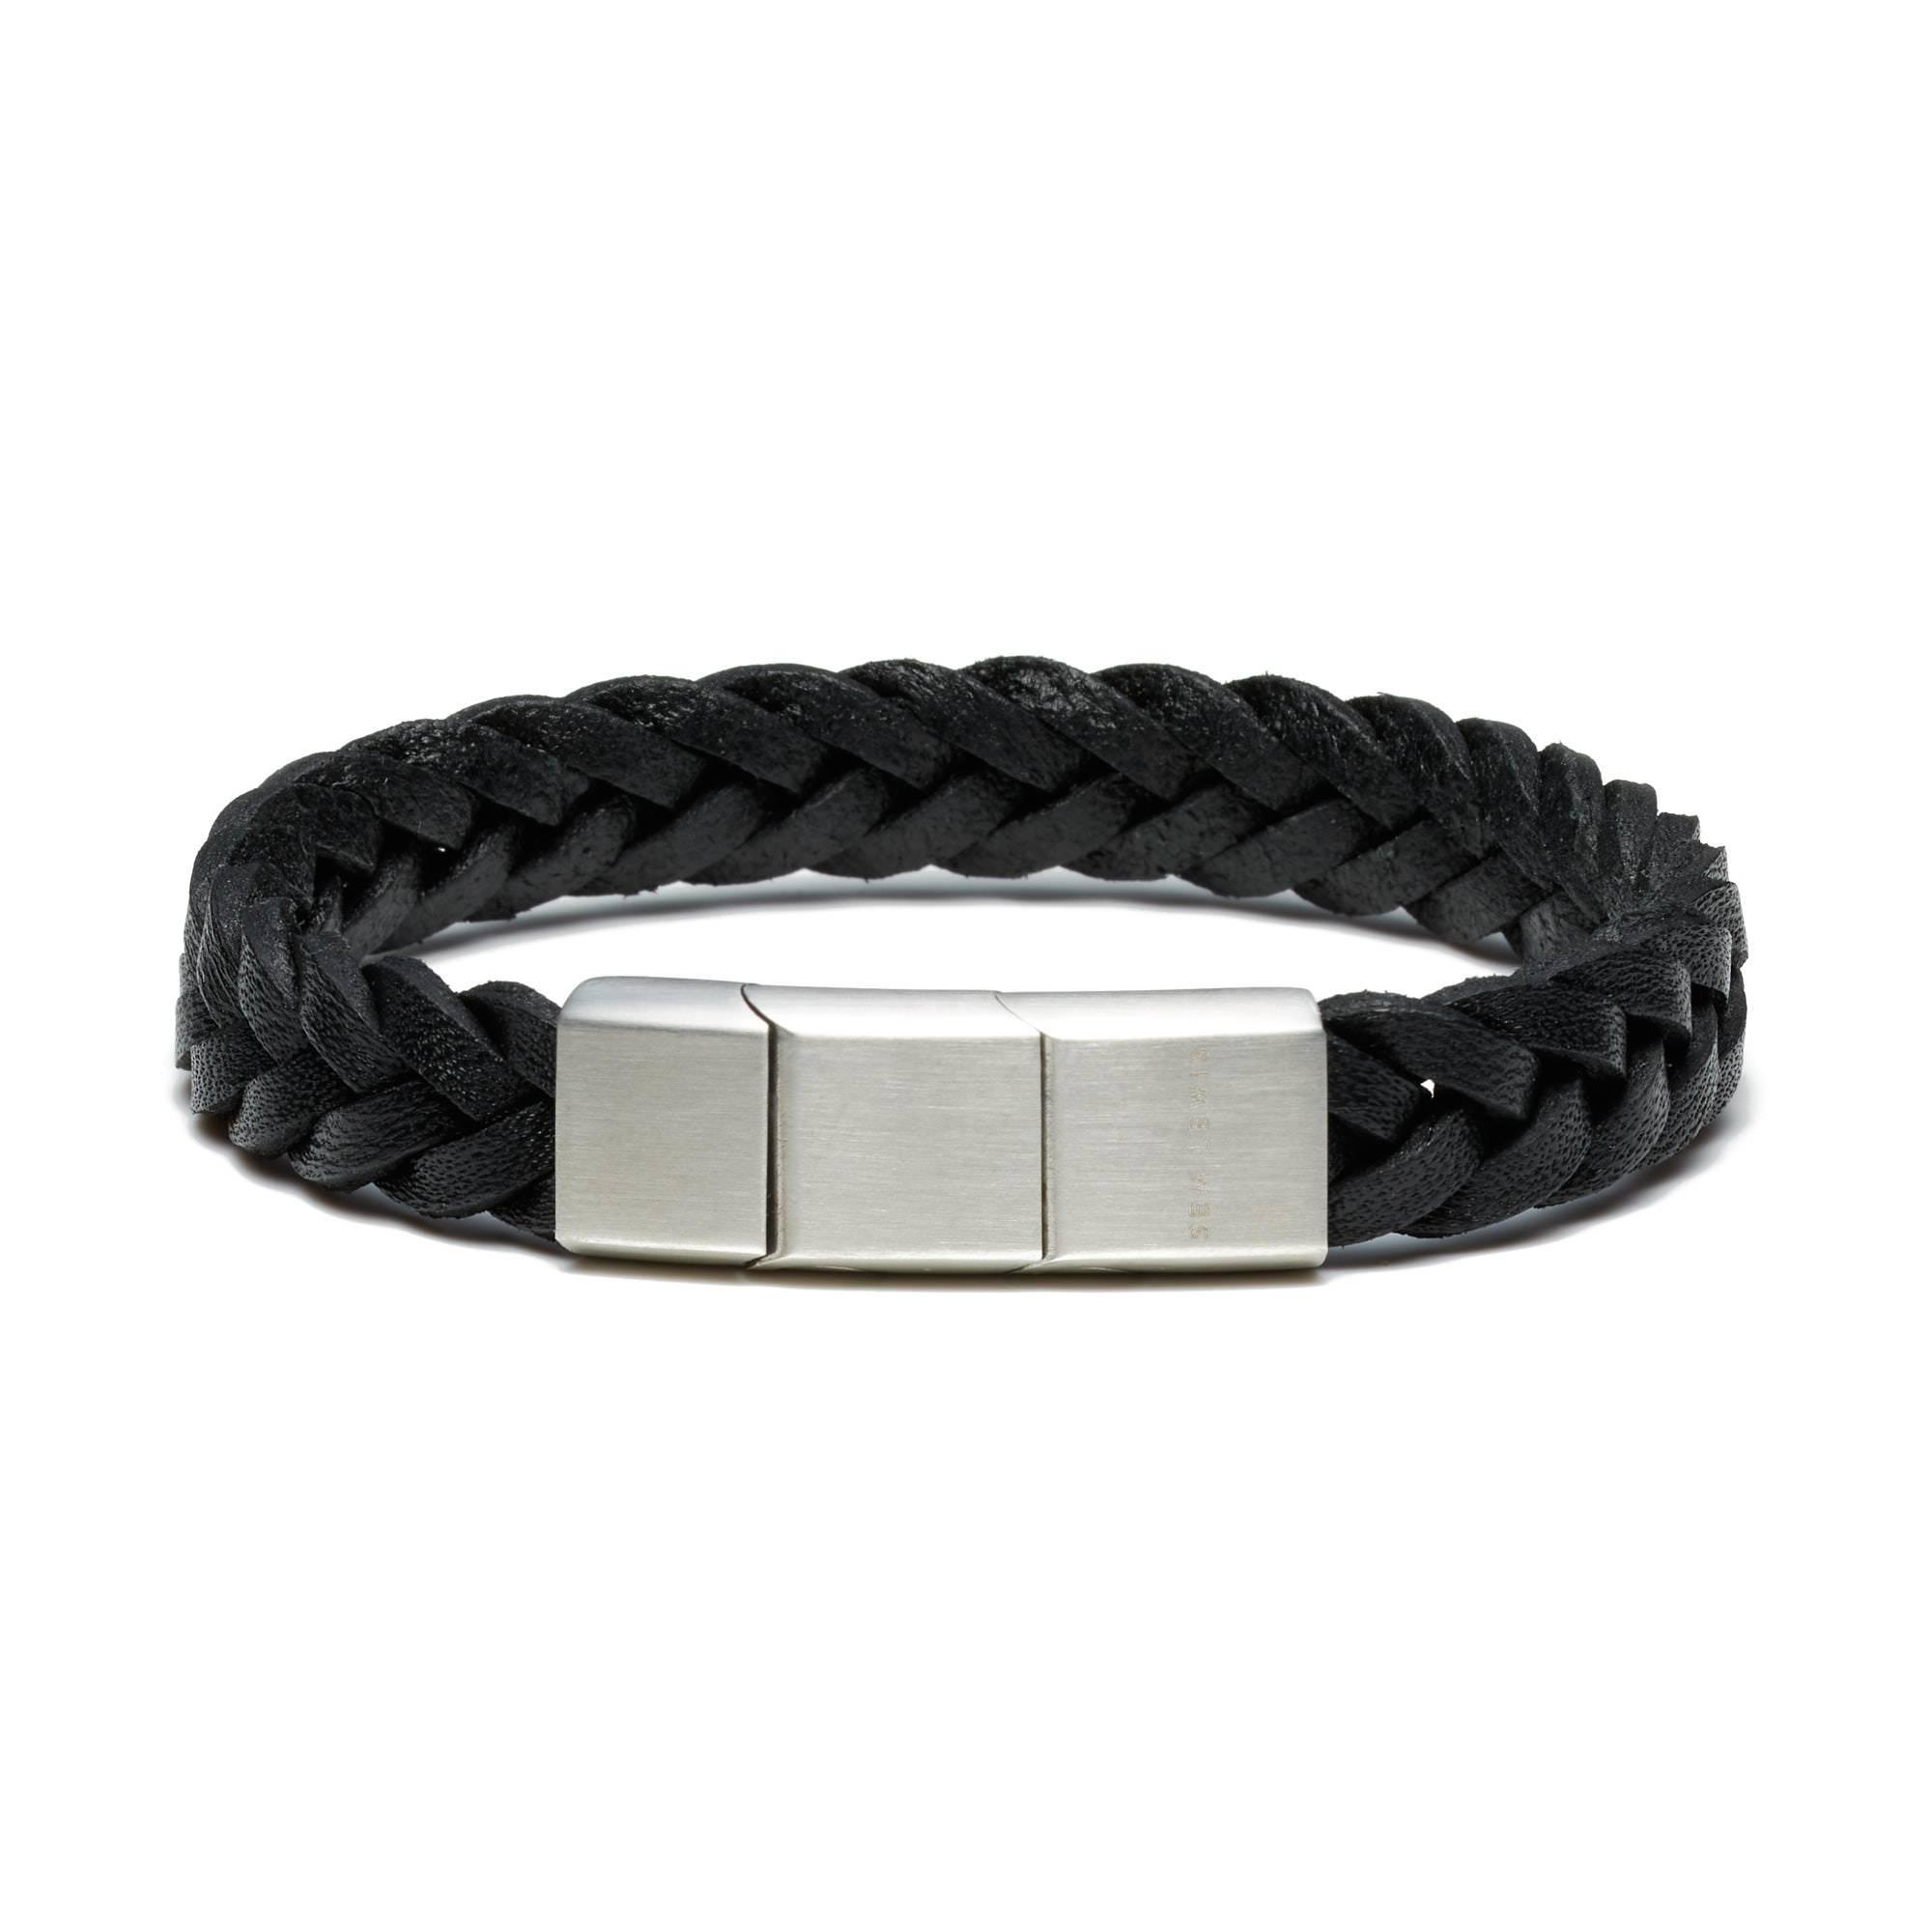 Bakerloo Paddington bracelet